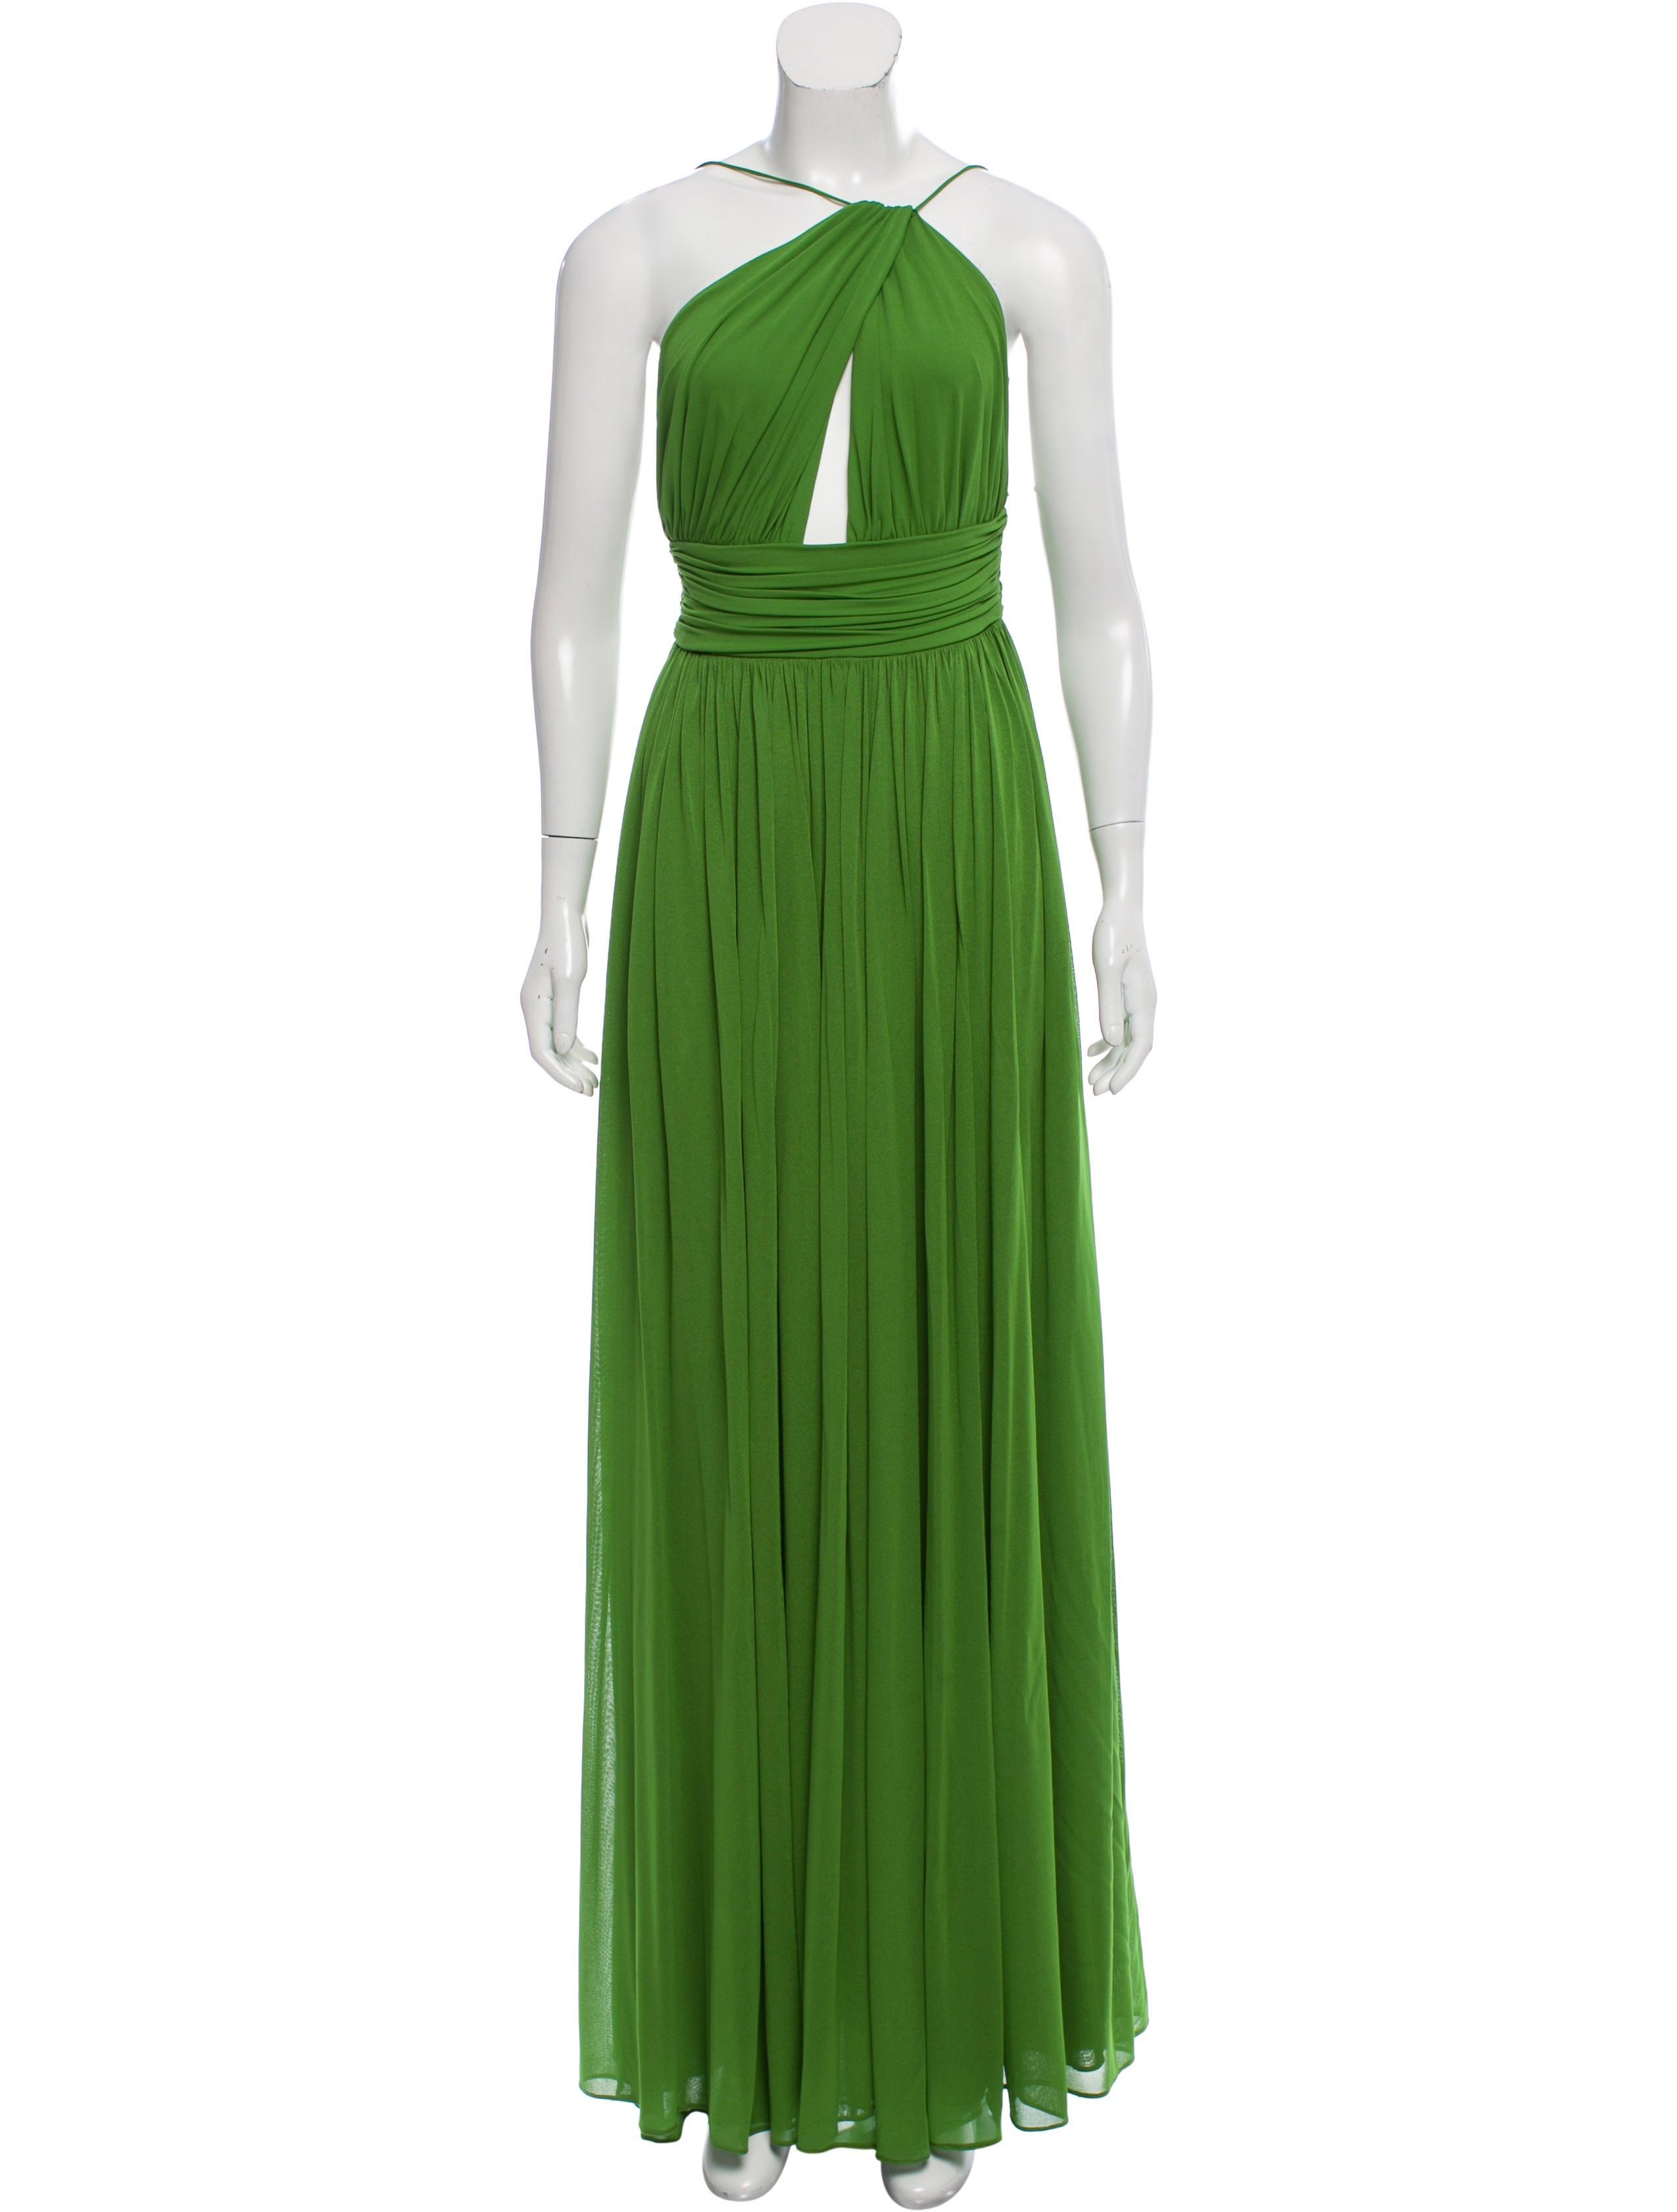 Michael Kors Strapless Evening Dress - Clothing - MIC53685 | The ...